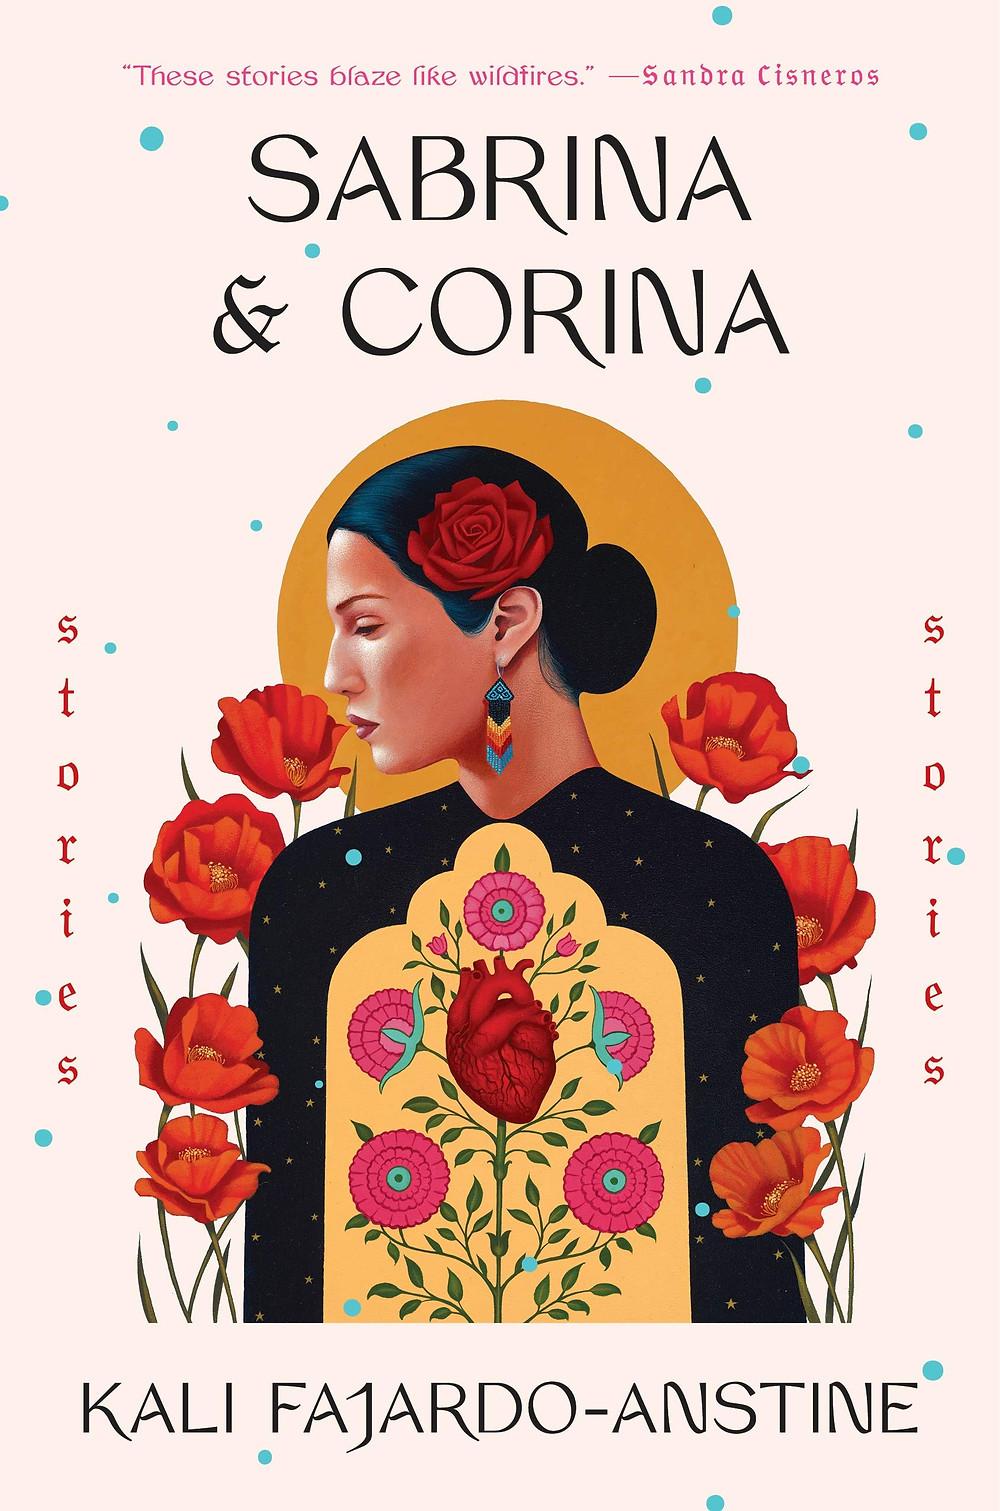 Sabrina & Corina by Kali Fajardo-Anstine : the book slut book reviews thebookslut best floral book covers valentines day books